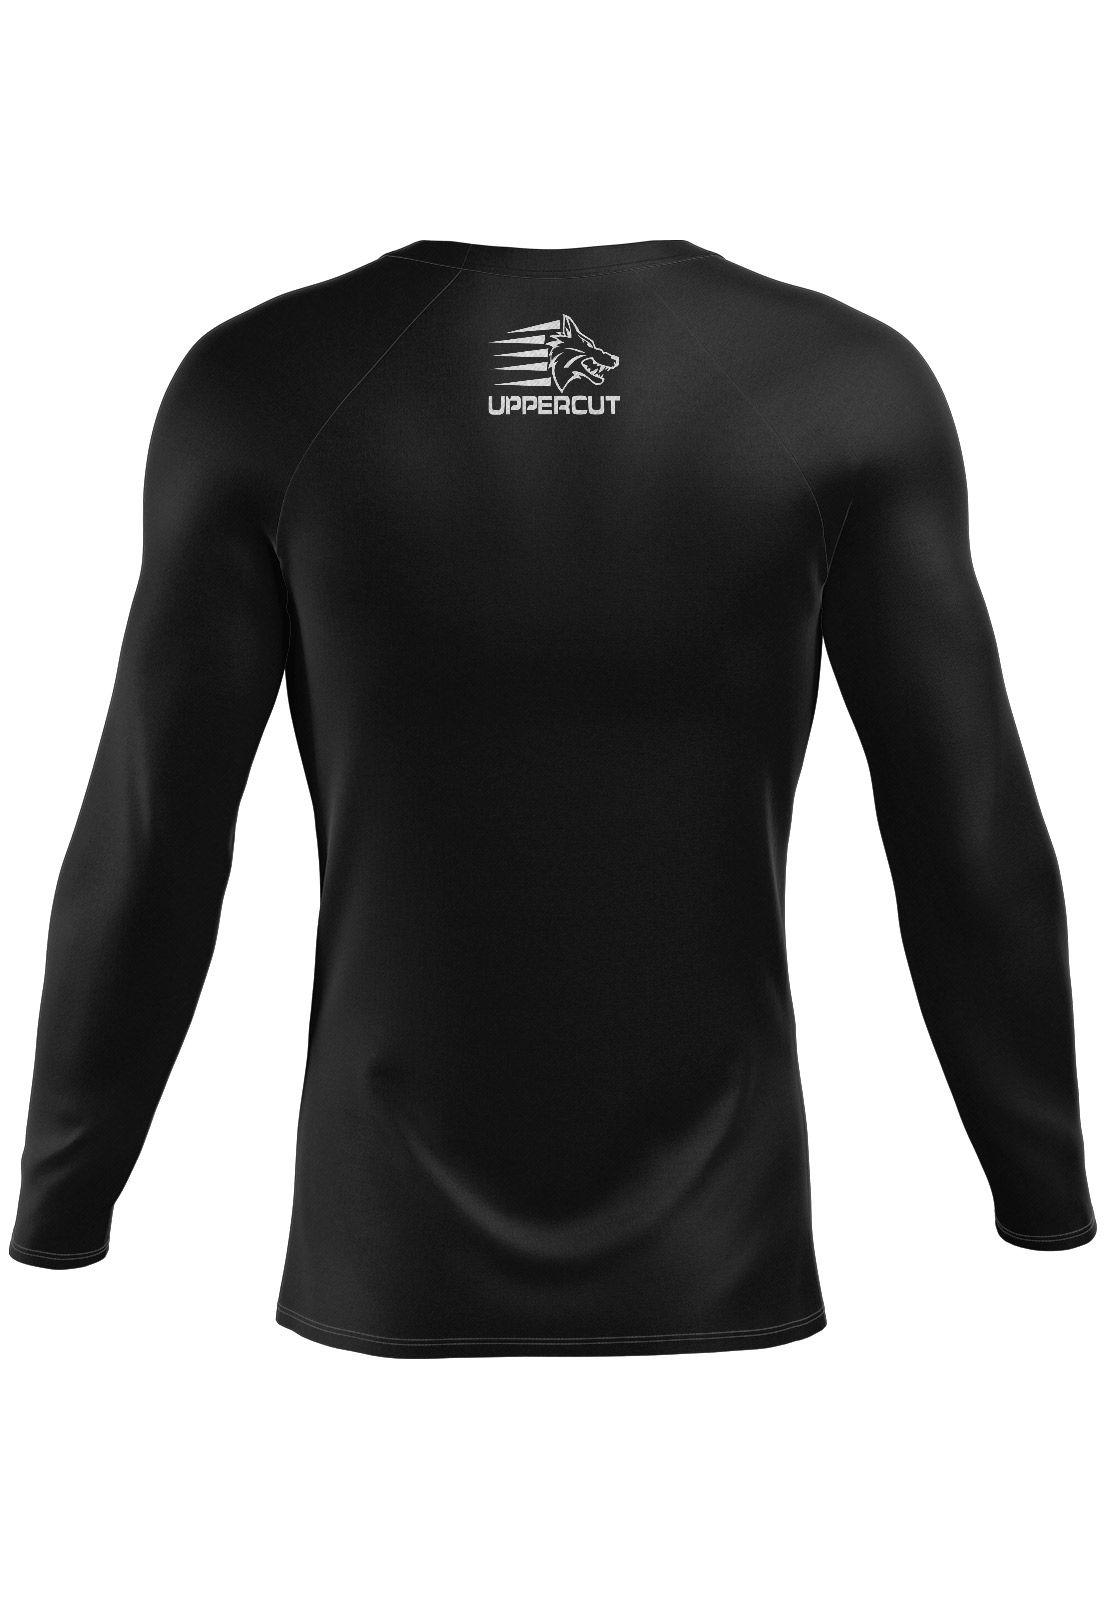 Camisa  Térmica  Ciclismo com Proteção Solar Uppercut